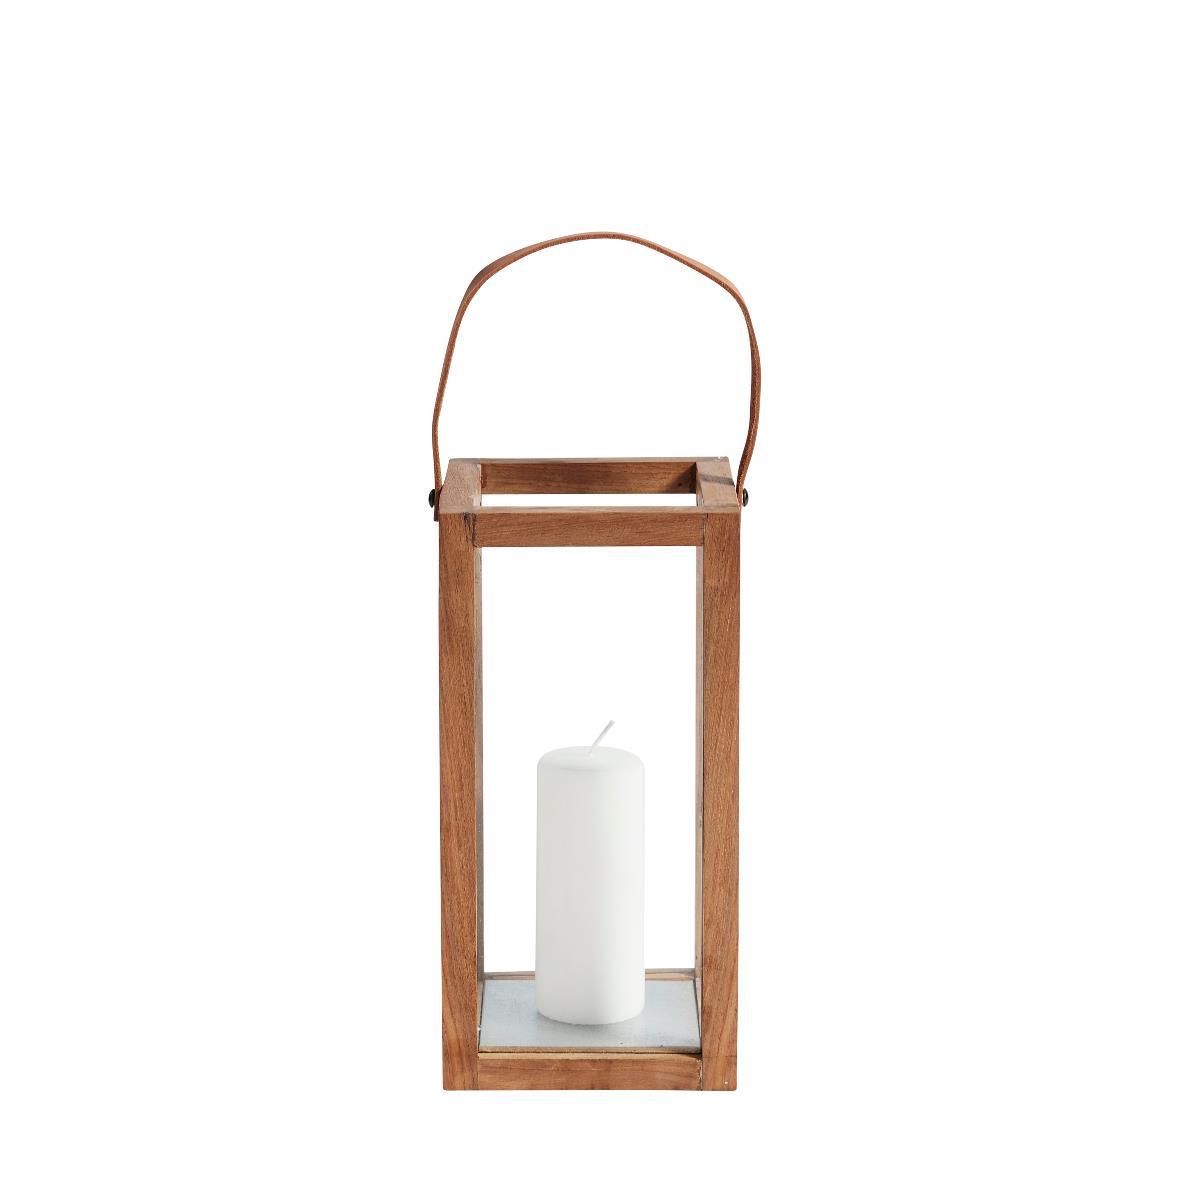 Muubs - Lantern Small - Recycled Teak (1121527501)